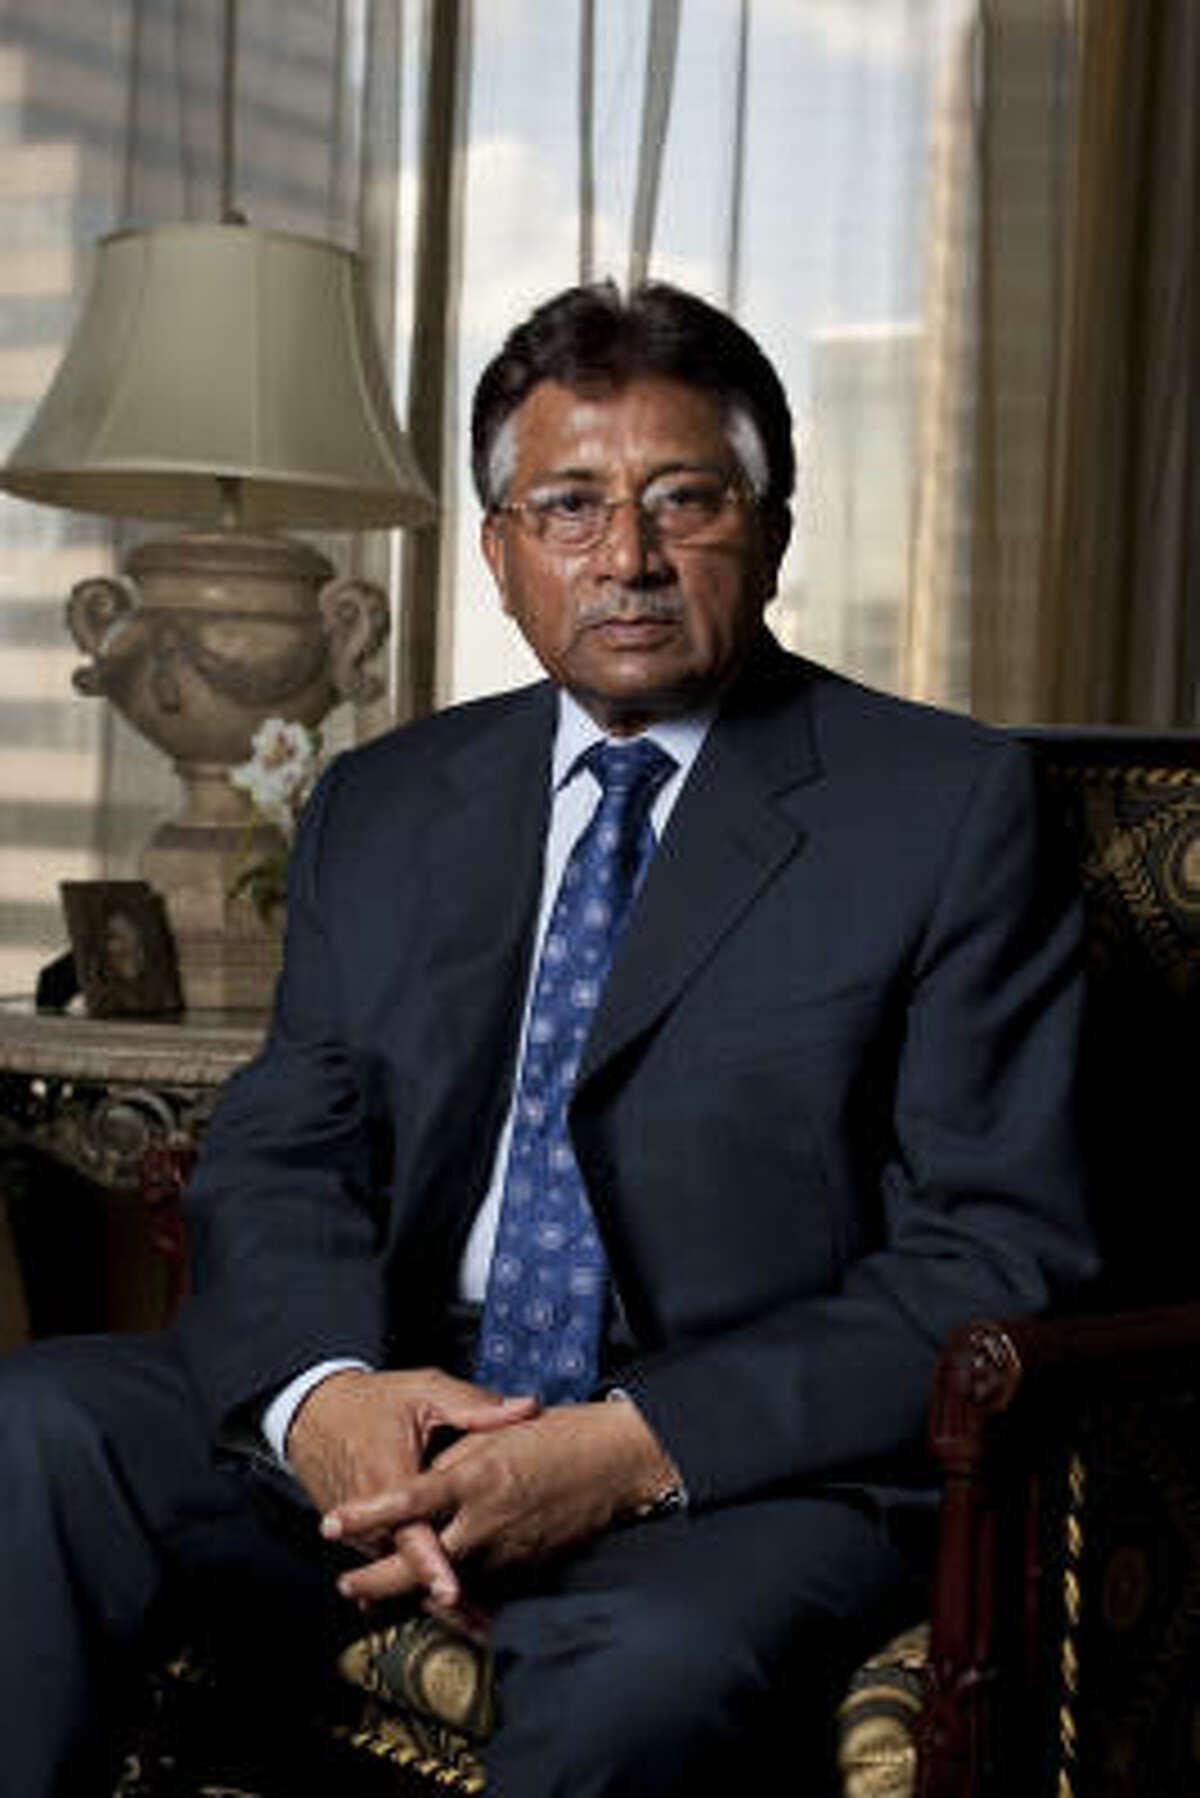 Pervez Musharraf will meet with former President George H.W. Bush and Joanne King Herring.